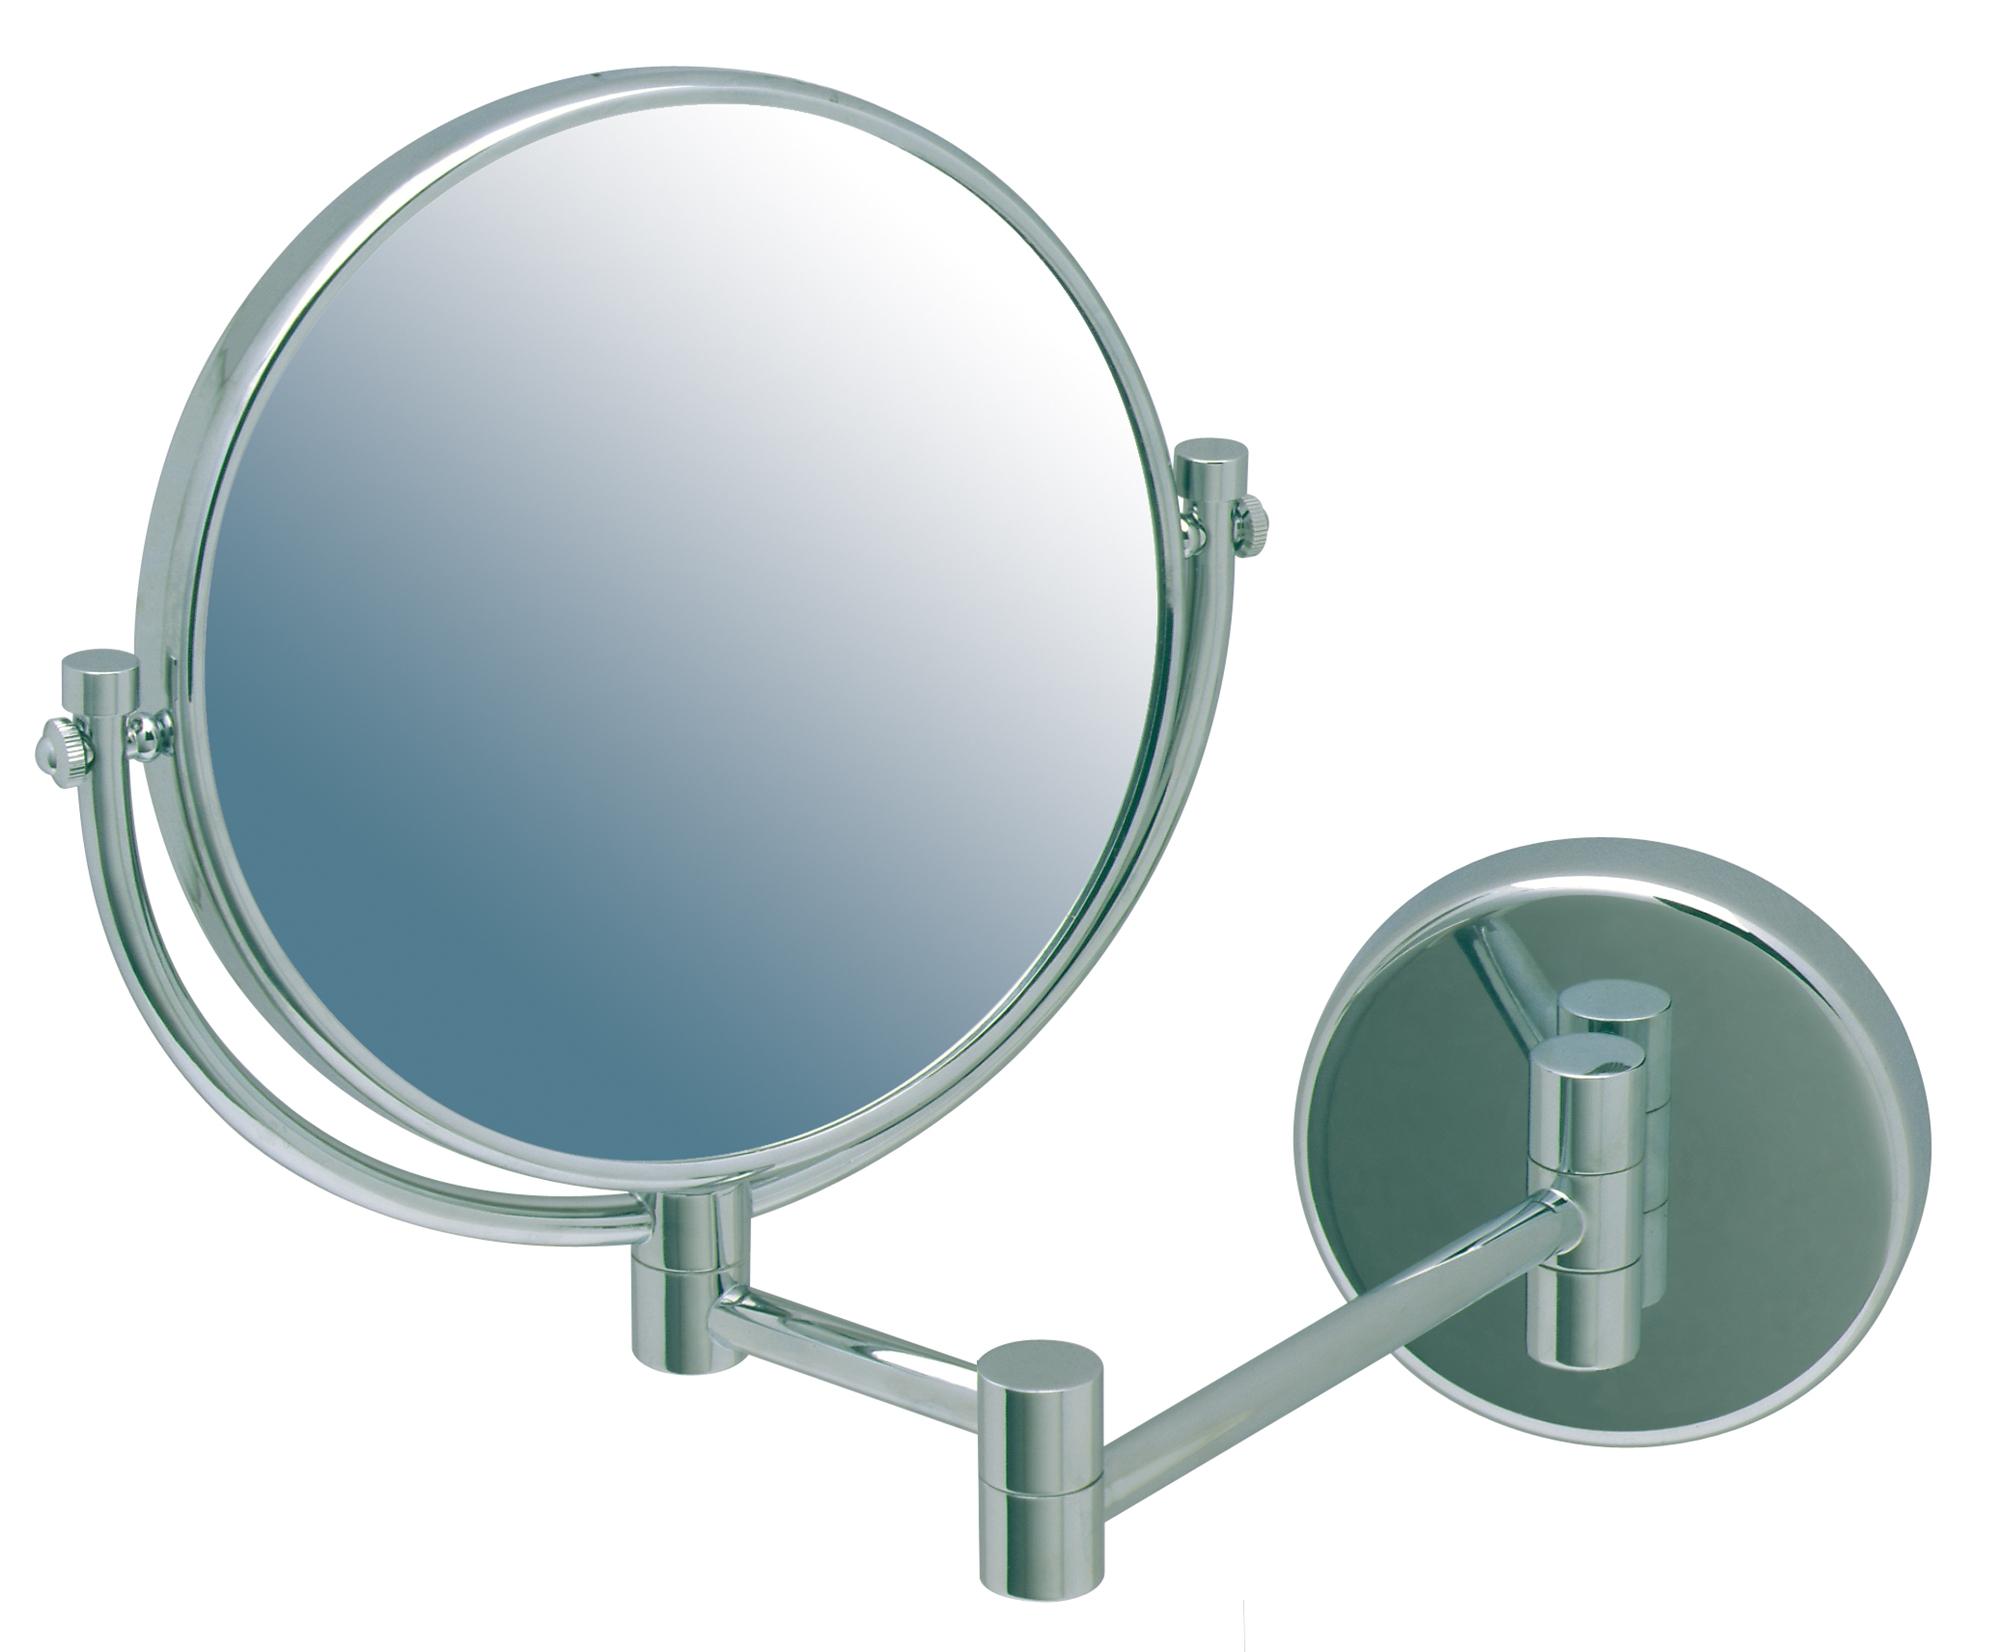 Miroir grossissant double face rond jvd - Miroir salle de bain chauffant ...